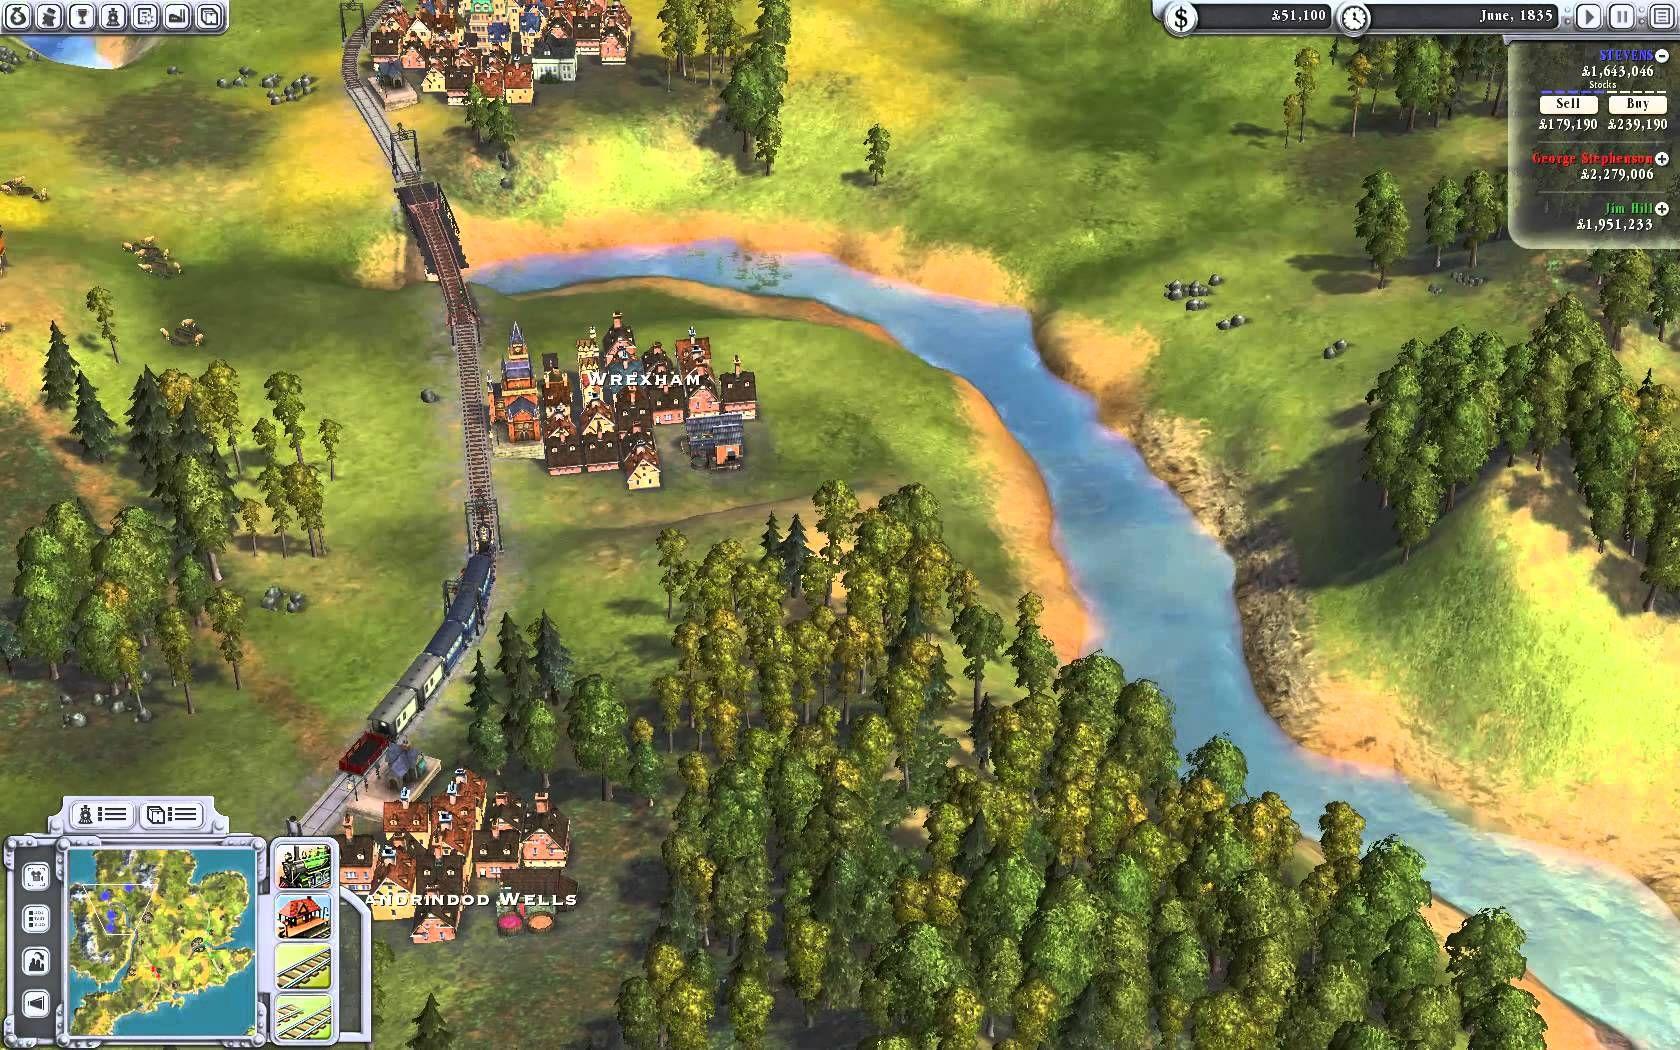 Sid Meier's Railroads Gameplay